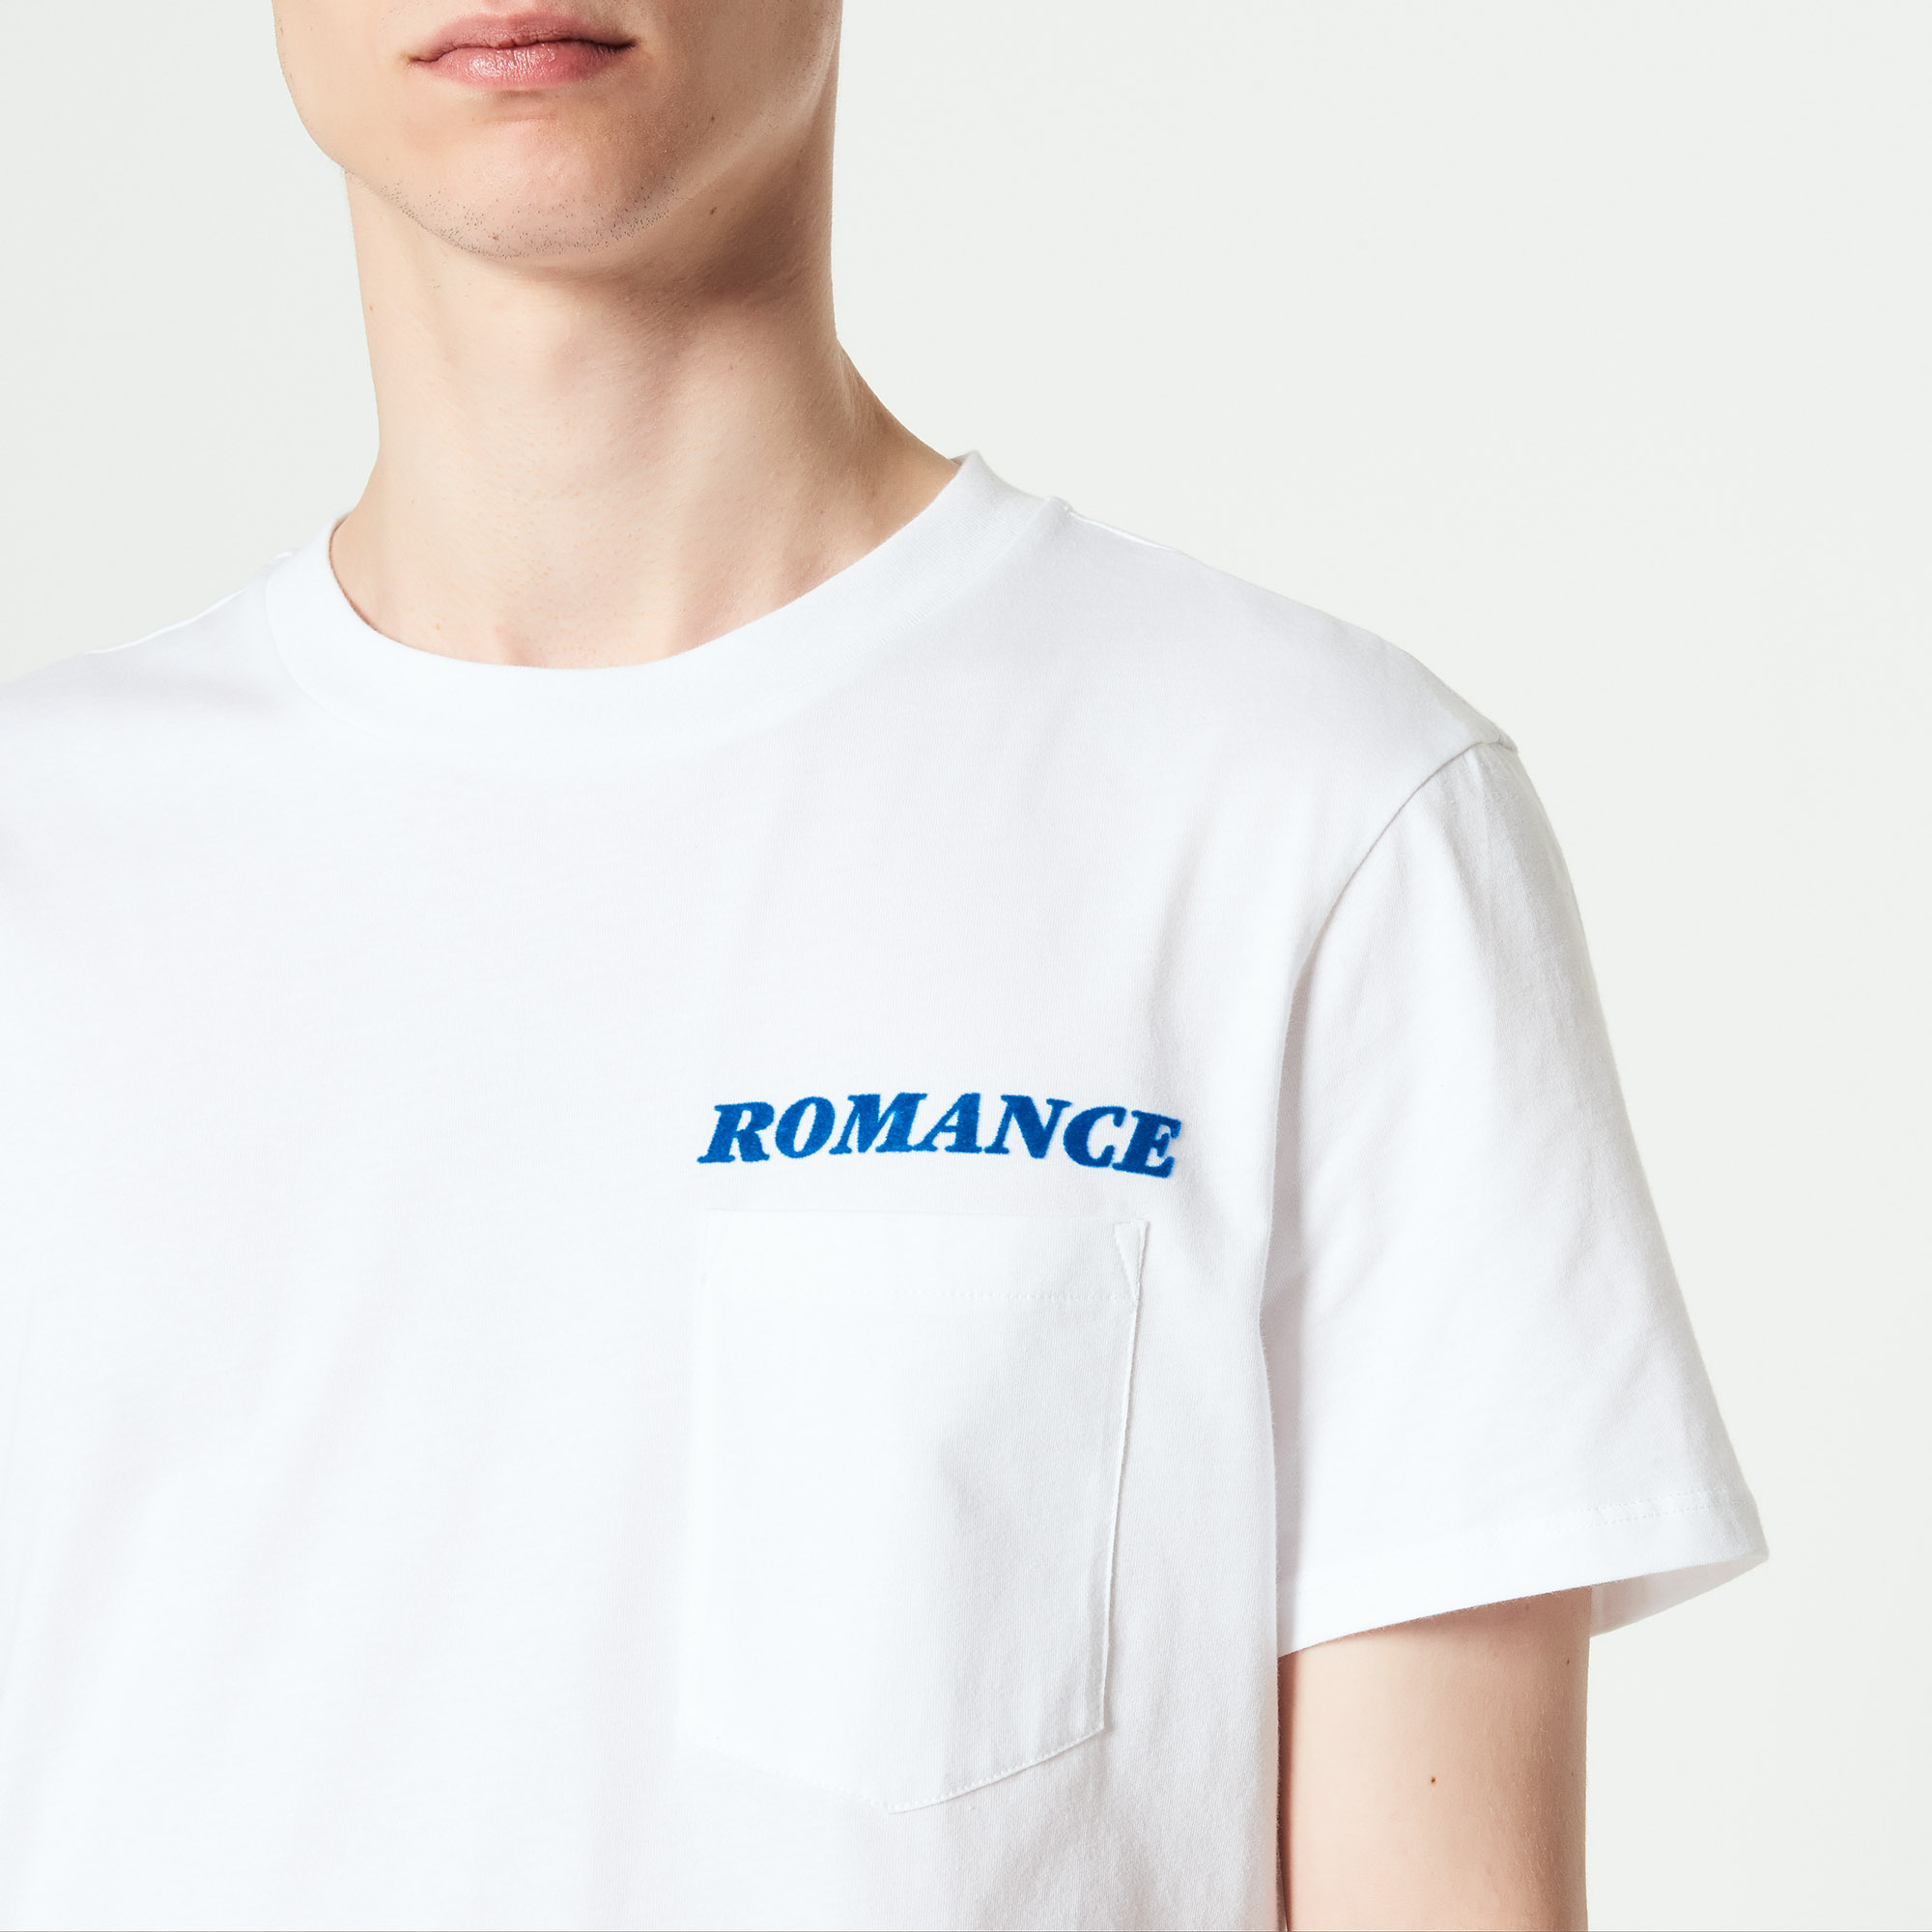 SHIRTS - Shirts Sandro Clearance Clearance Store ns4HG